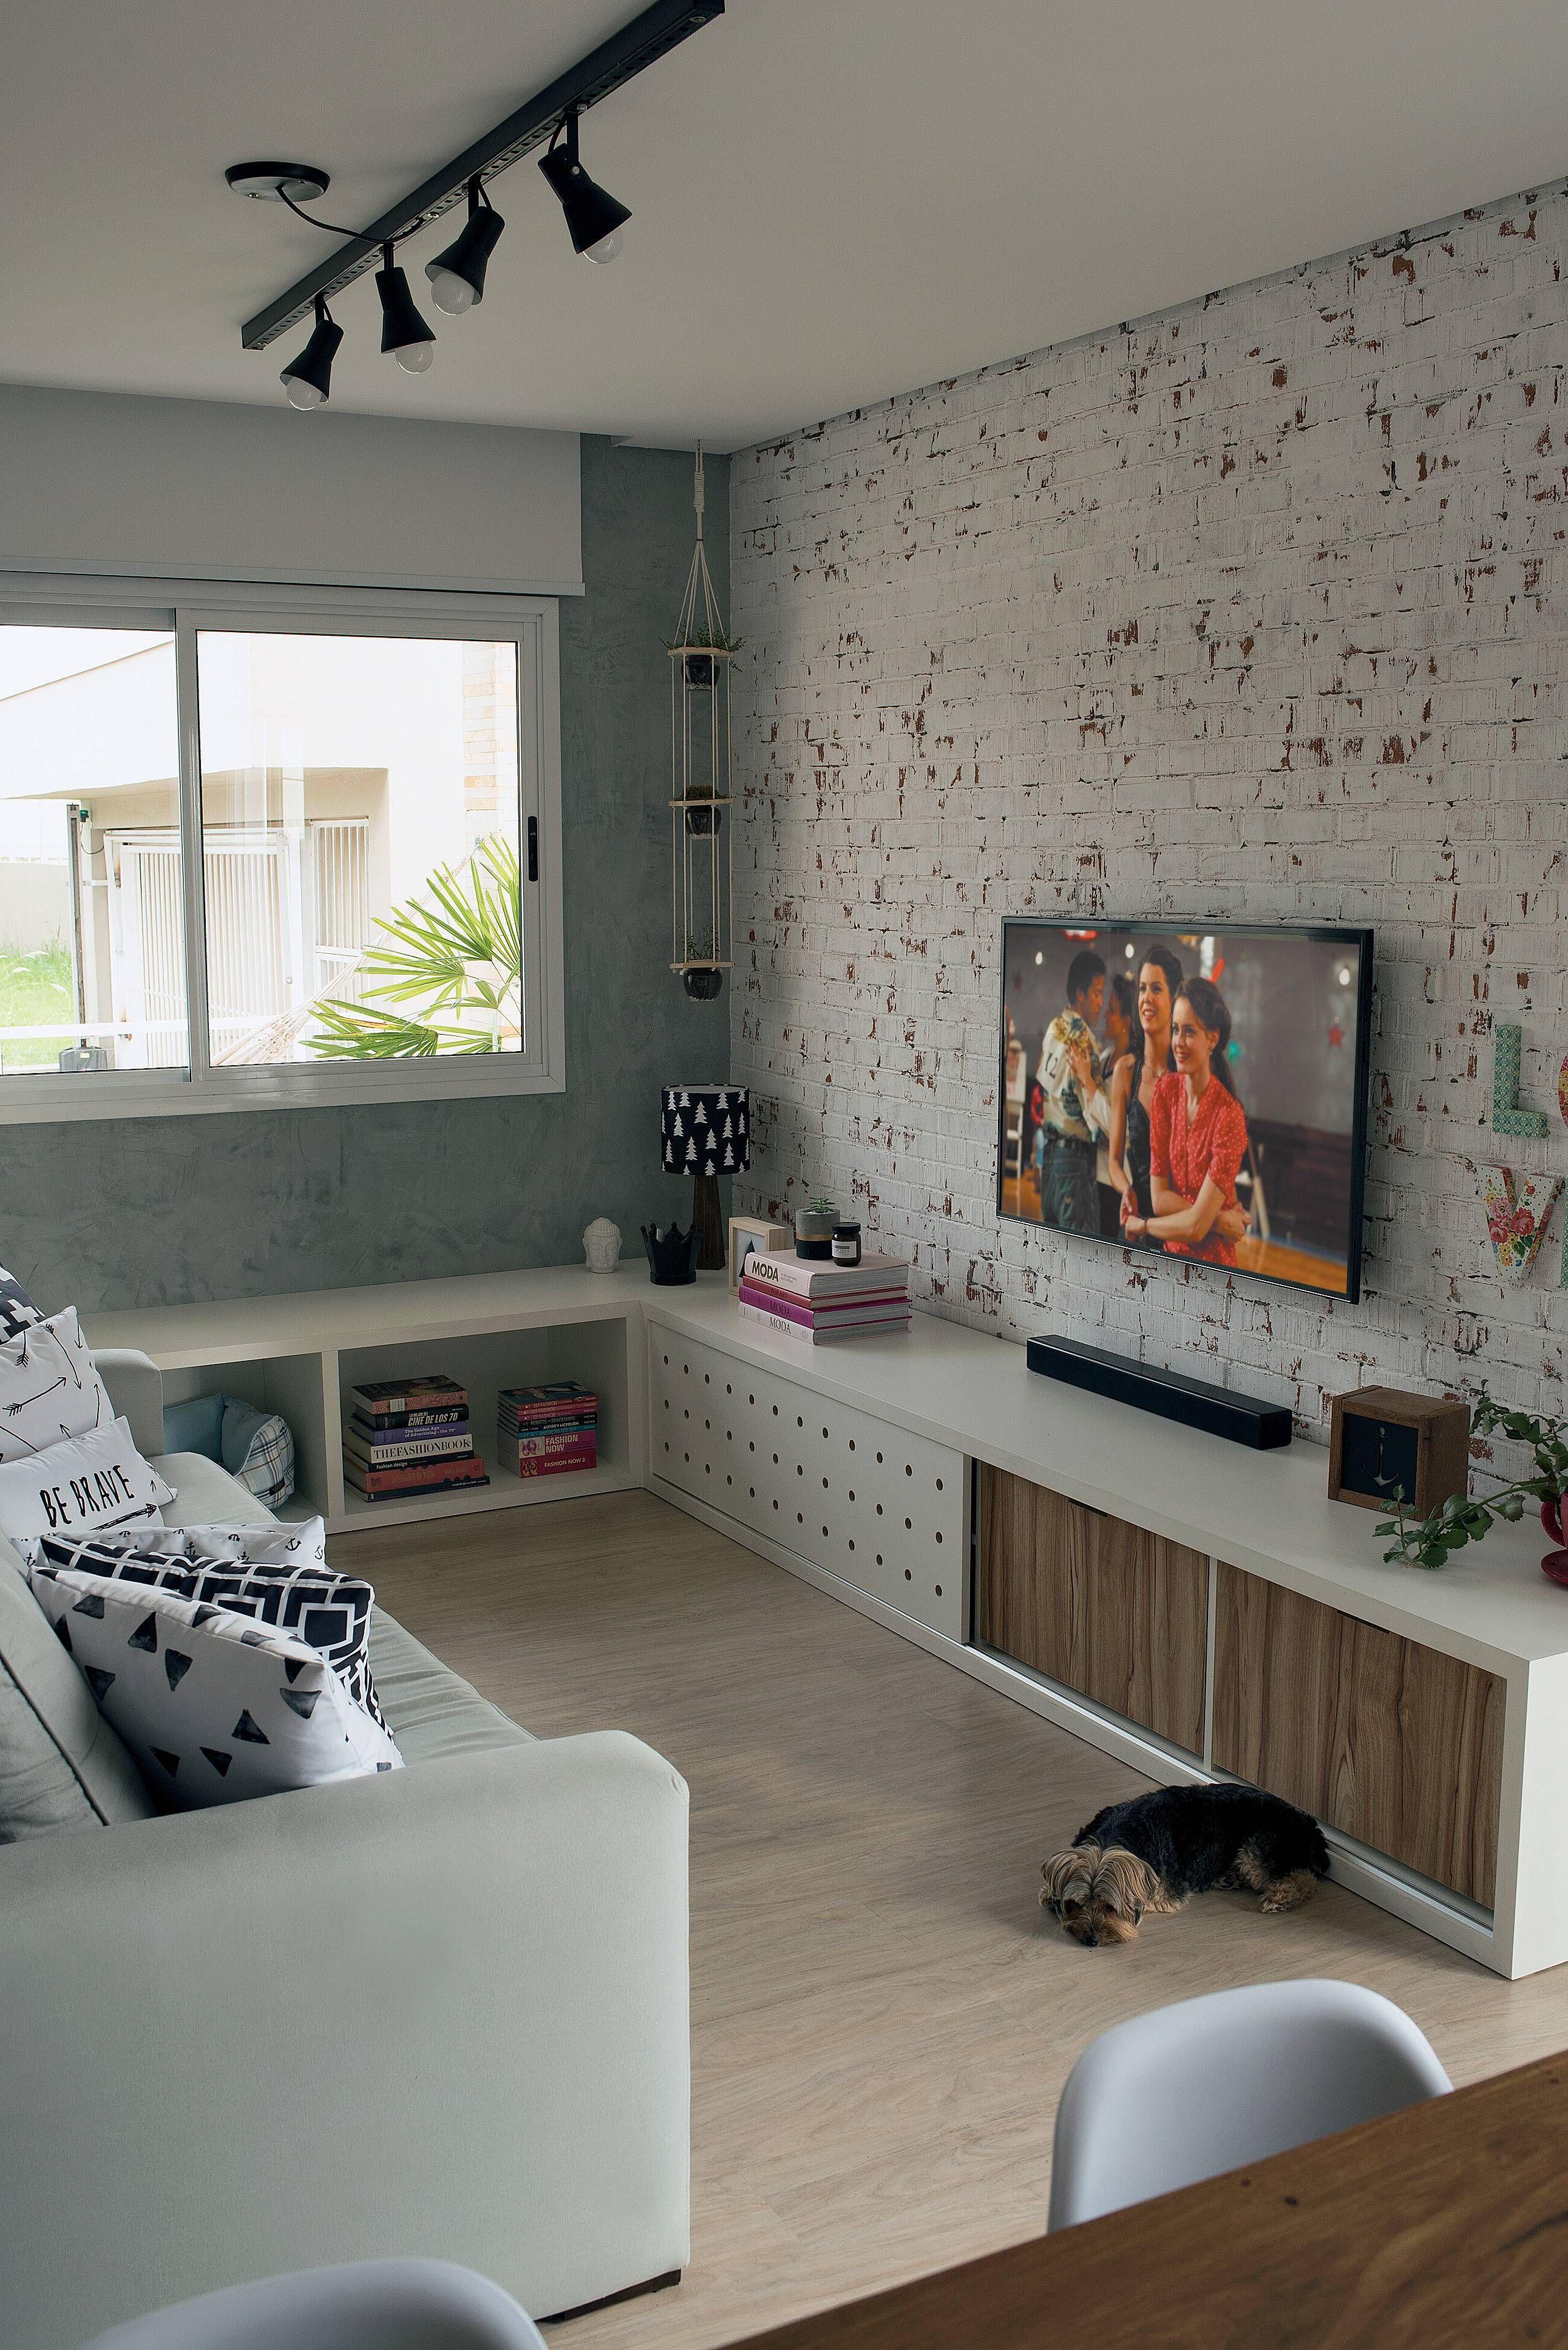 Casa Com Decoracao Inspirada Nos Estilos Escandinavo E Industrial - Estilos-de-casa